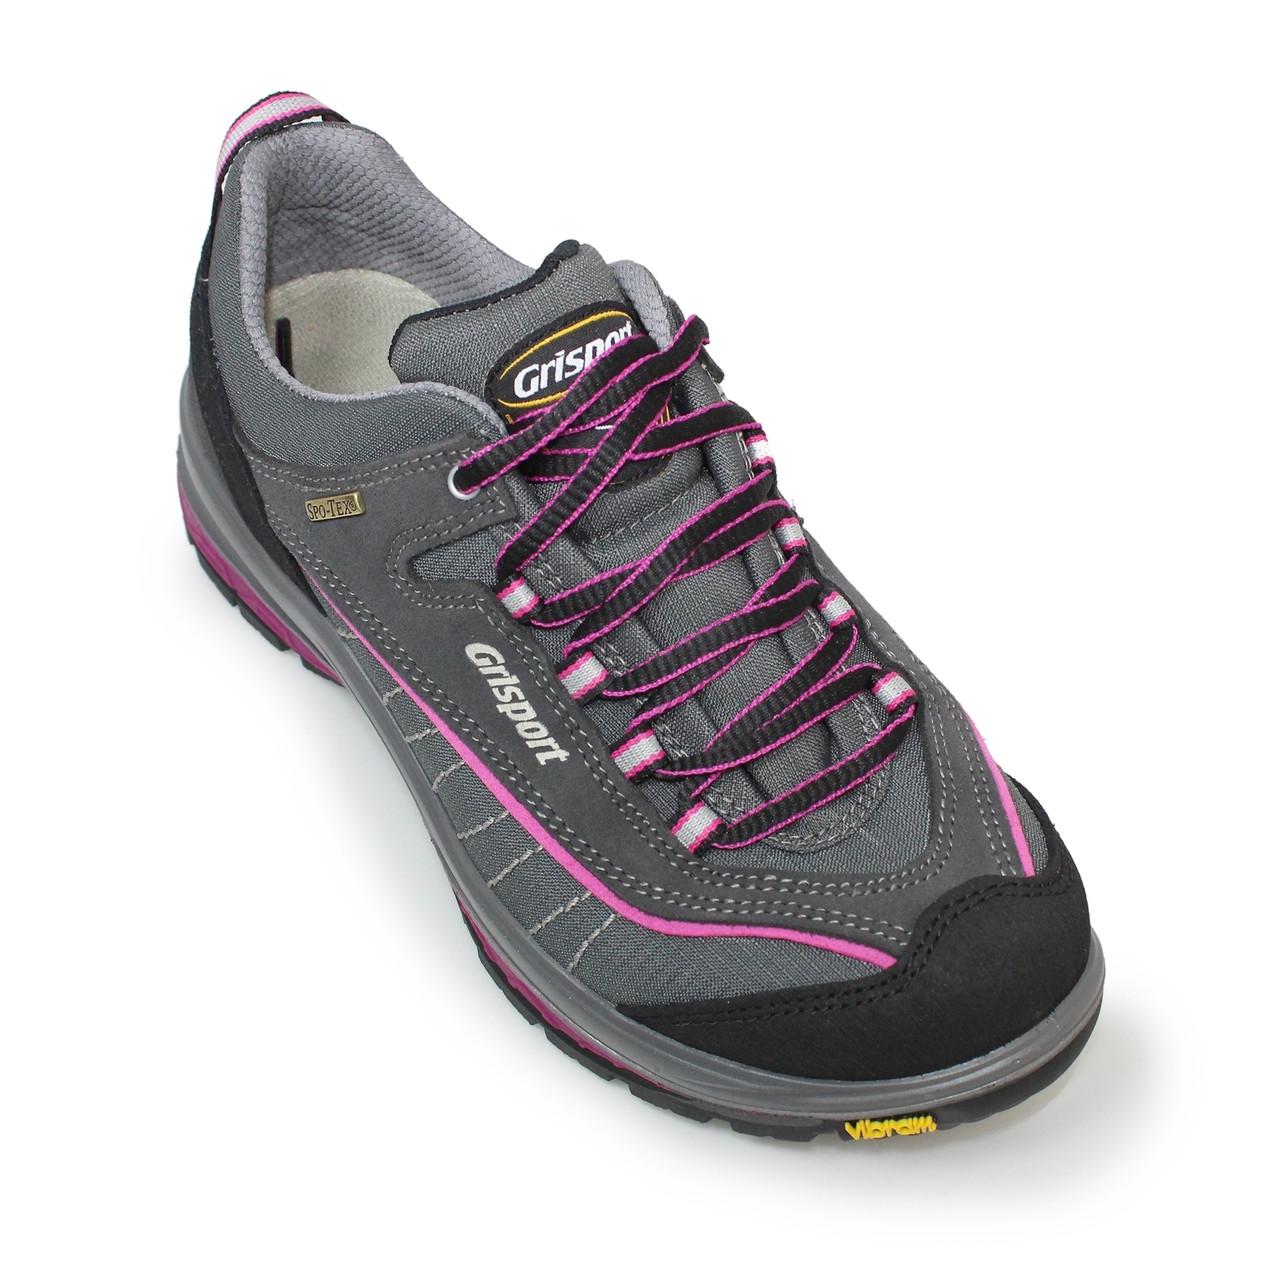 Grisport Lady Nova Womens Ladies Lightweight Waterproof Walking Shoes Trainers